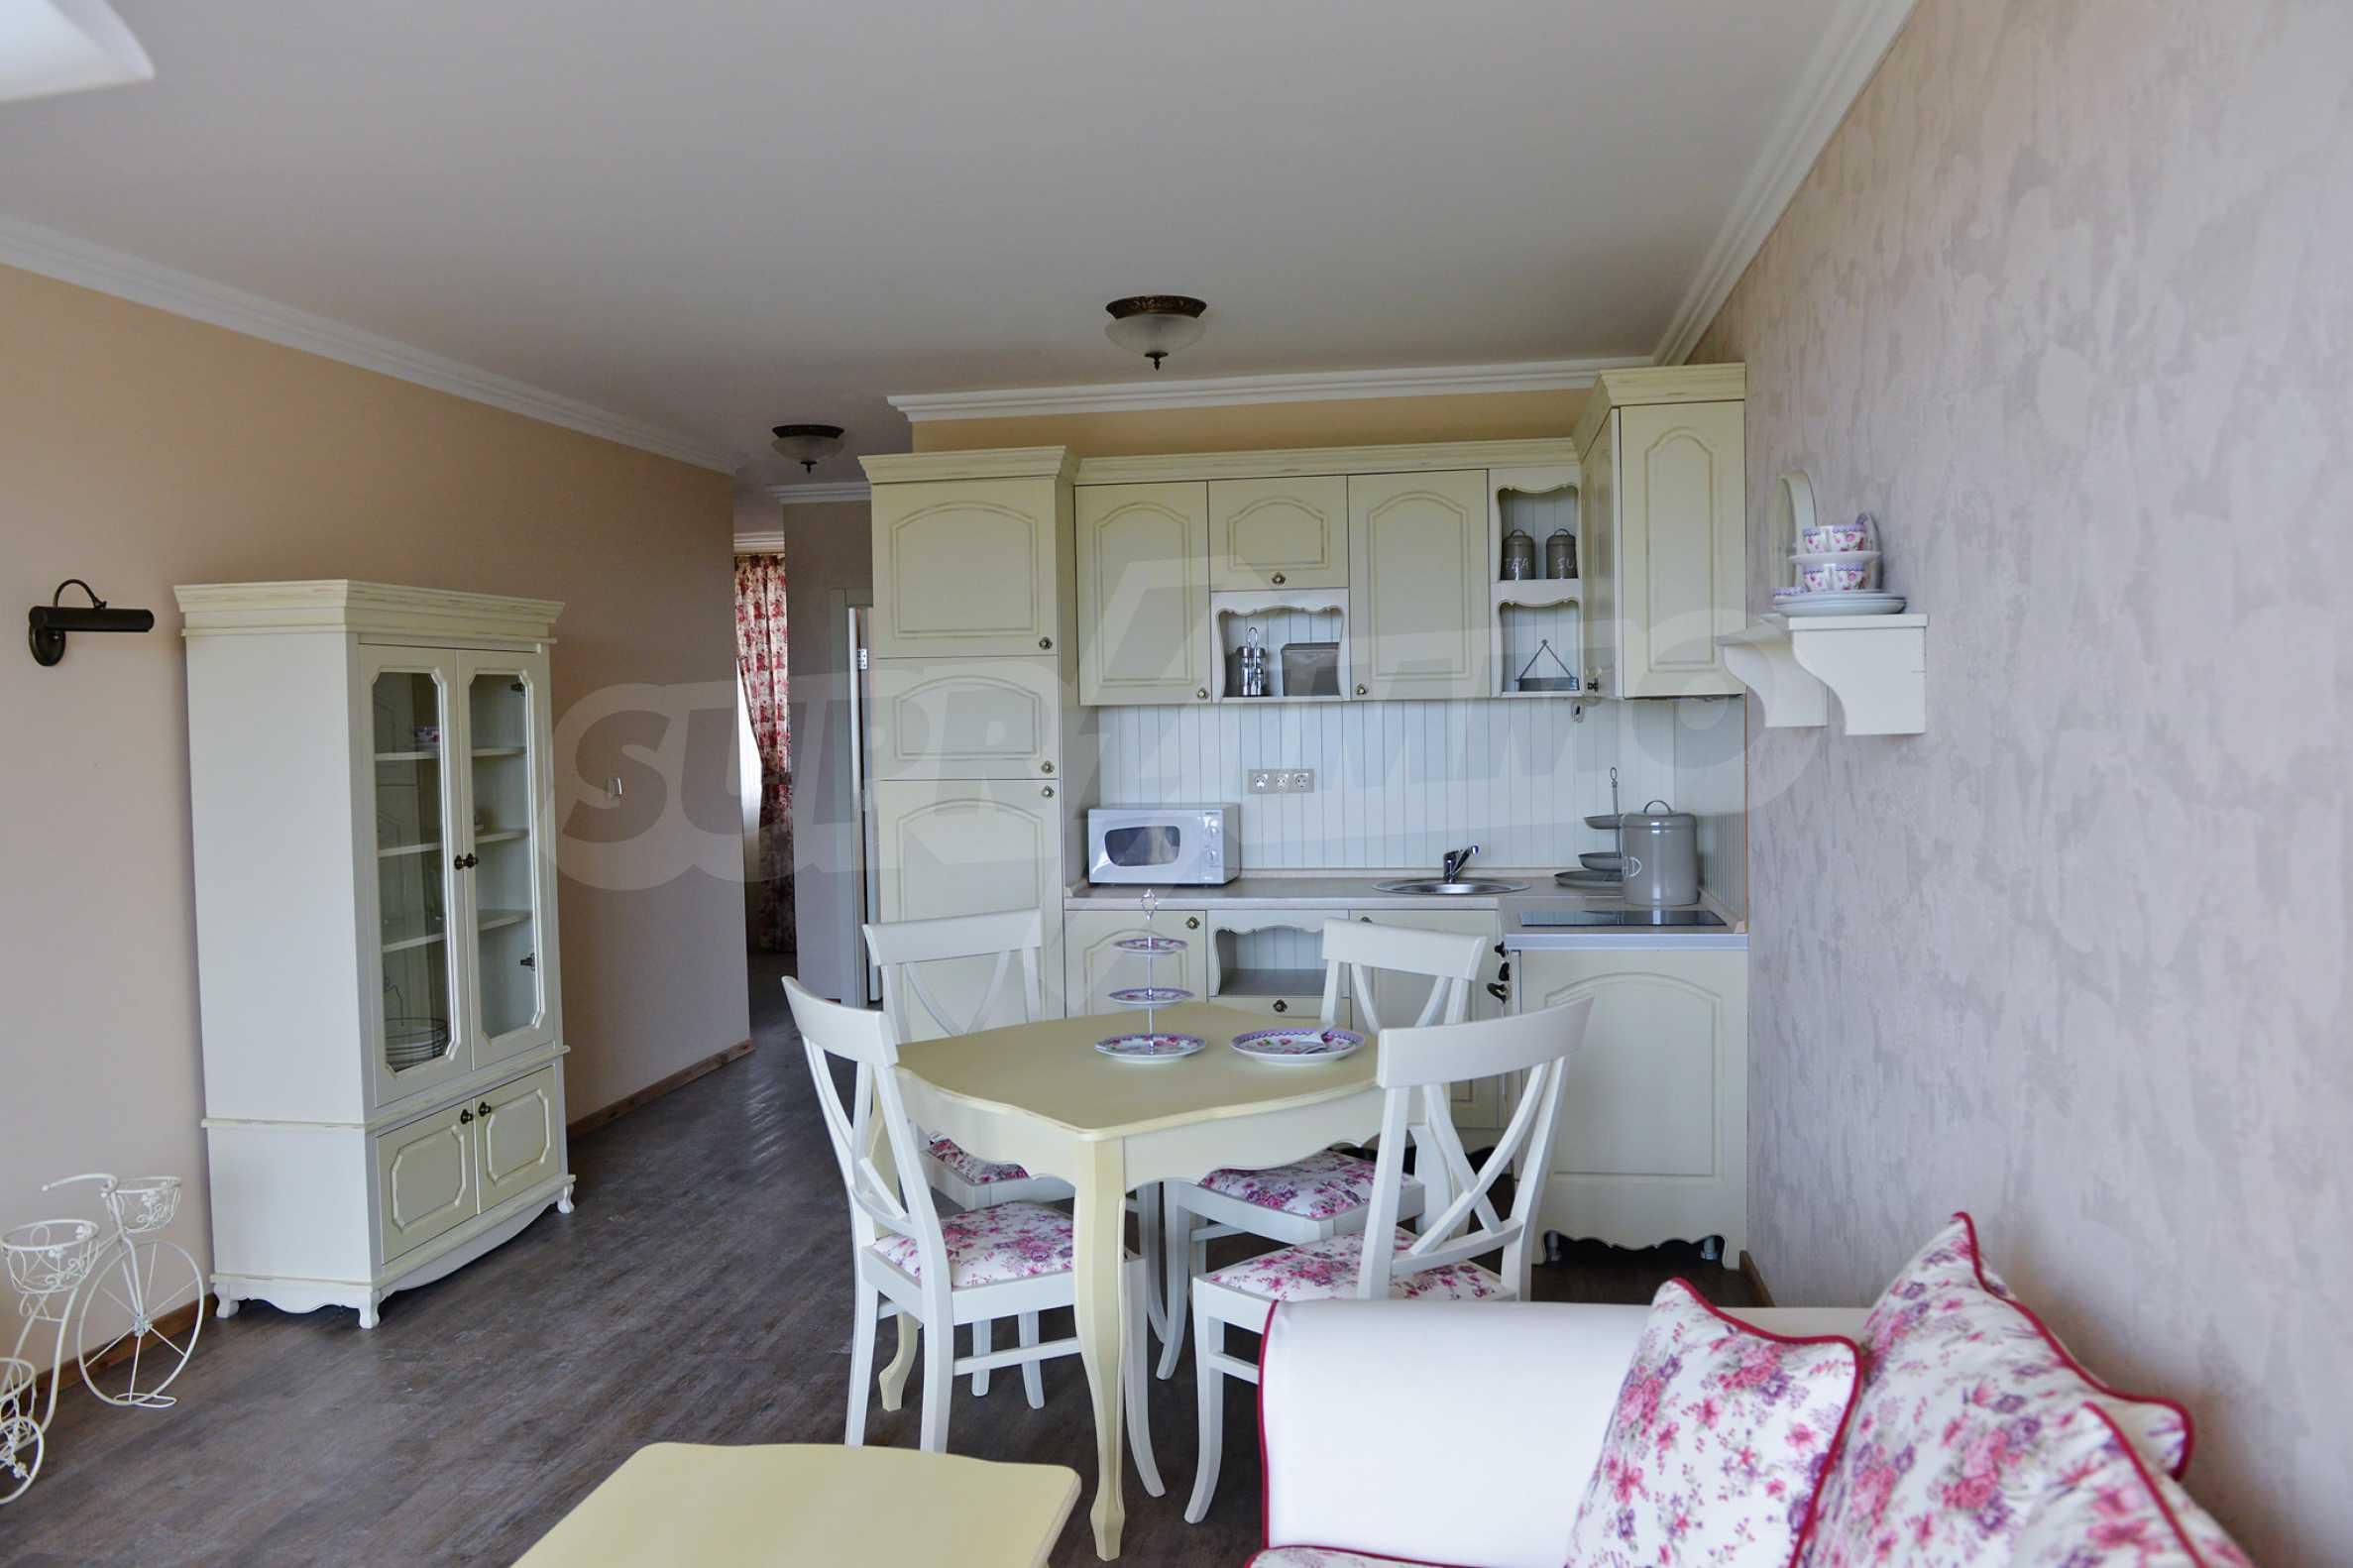 New apartment complex Atia resort in Chernomorets 26